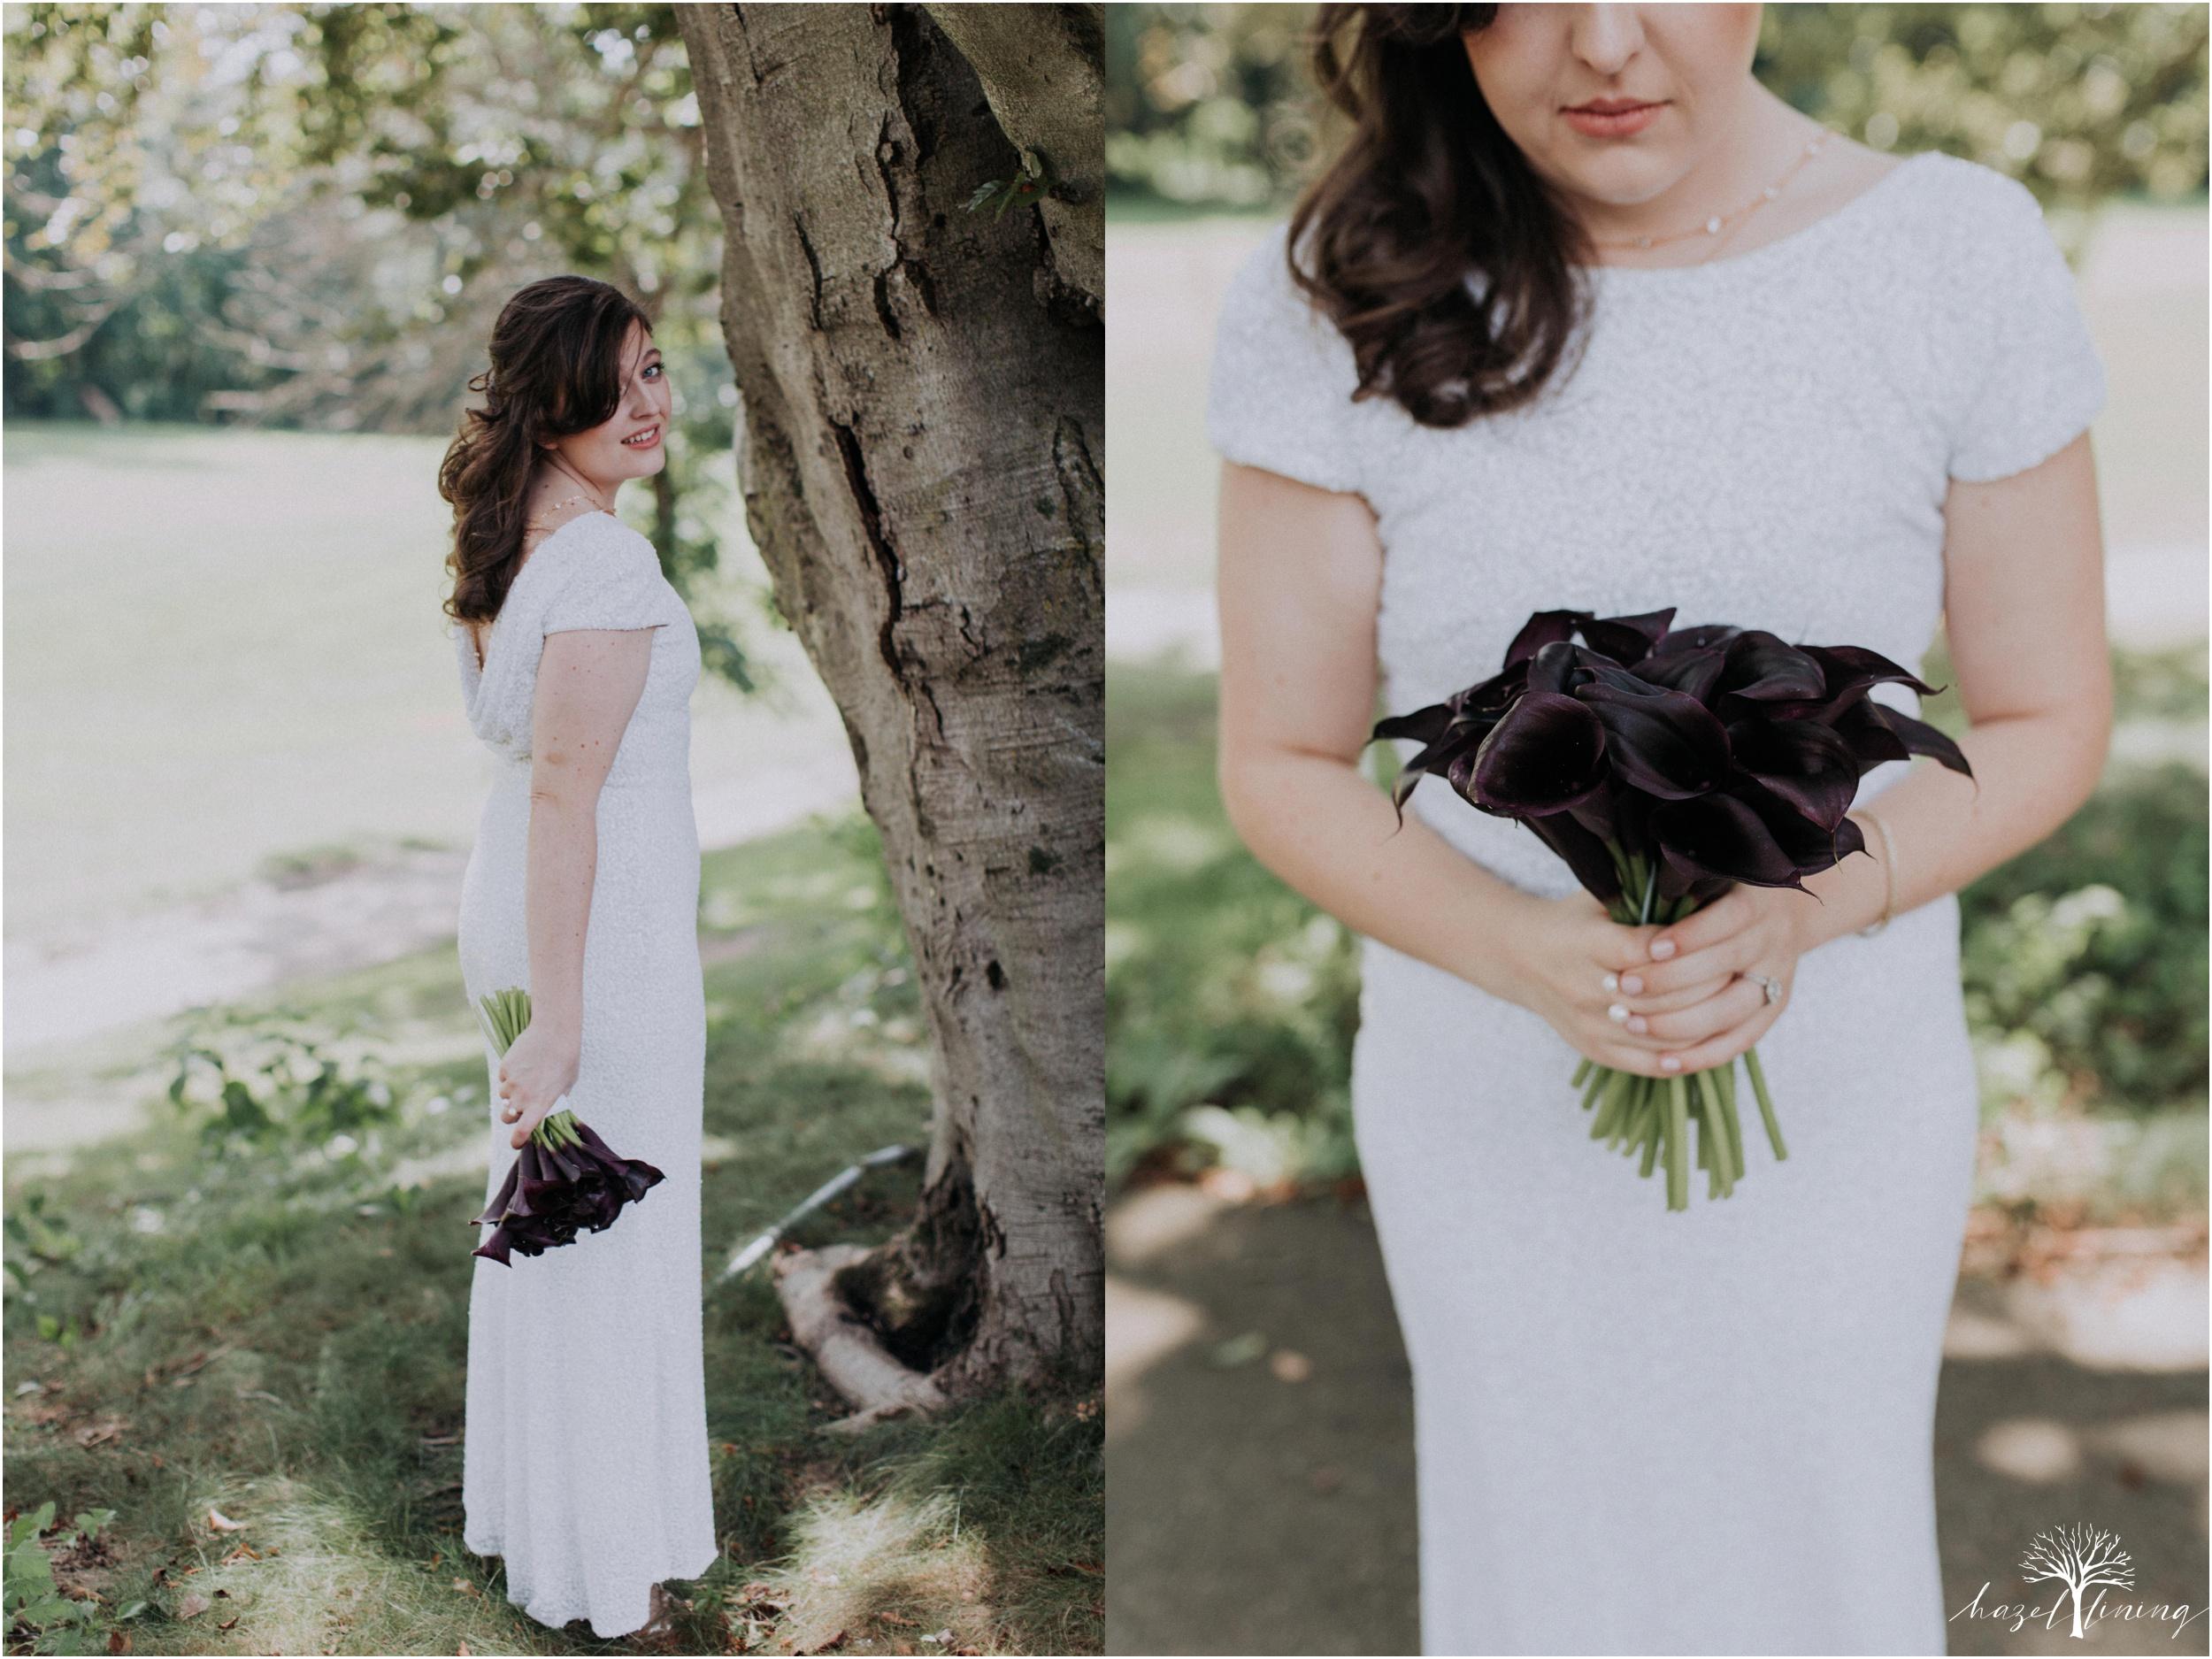 elizabeth-doelp-andrew-foreback-middletown-country-club-summer-langhorne-pennsylvania-wedding-hazel-lining-travel-wedding-elopement-photography_0044.jpg